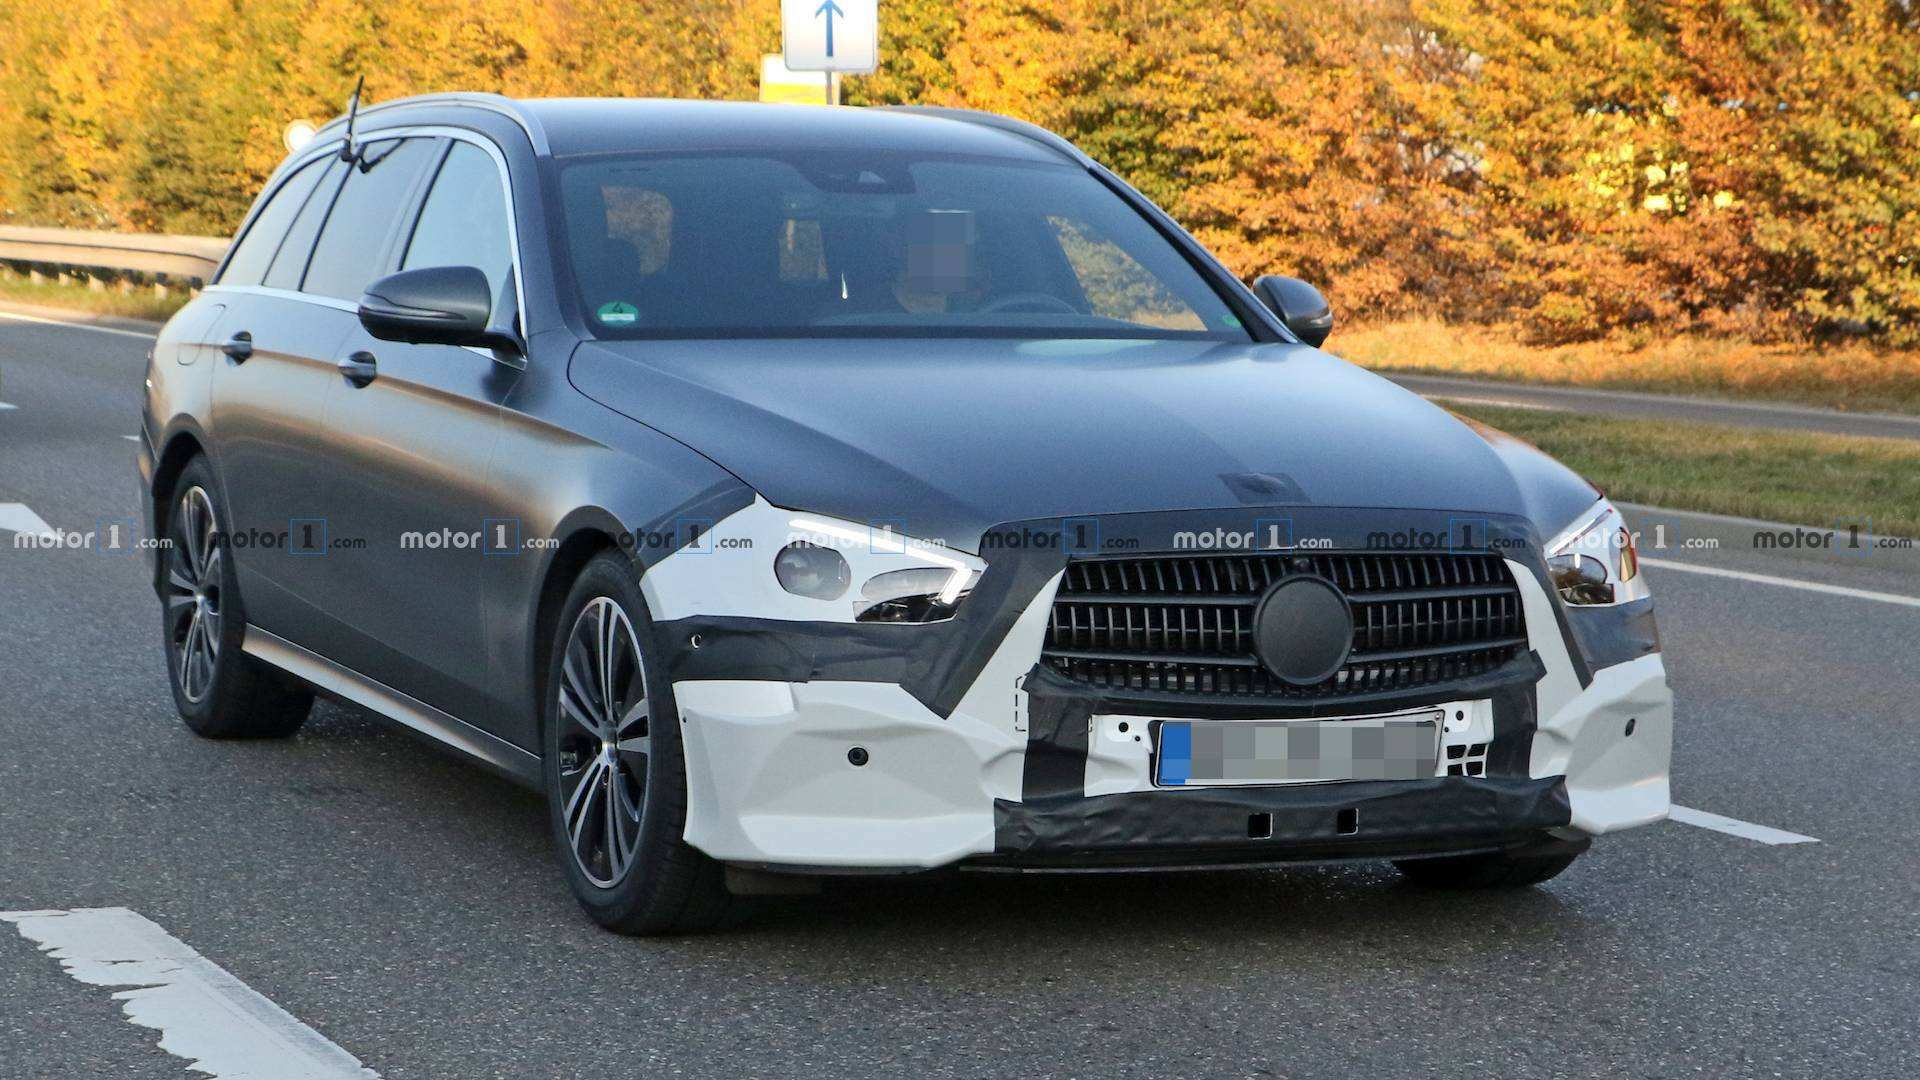 80 Concept of Spy Shots 2020 Mercedes E Class Ratings by Spy Shots 2020 Mercedes E Class